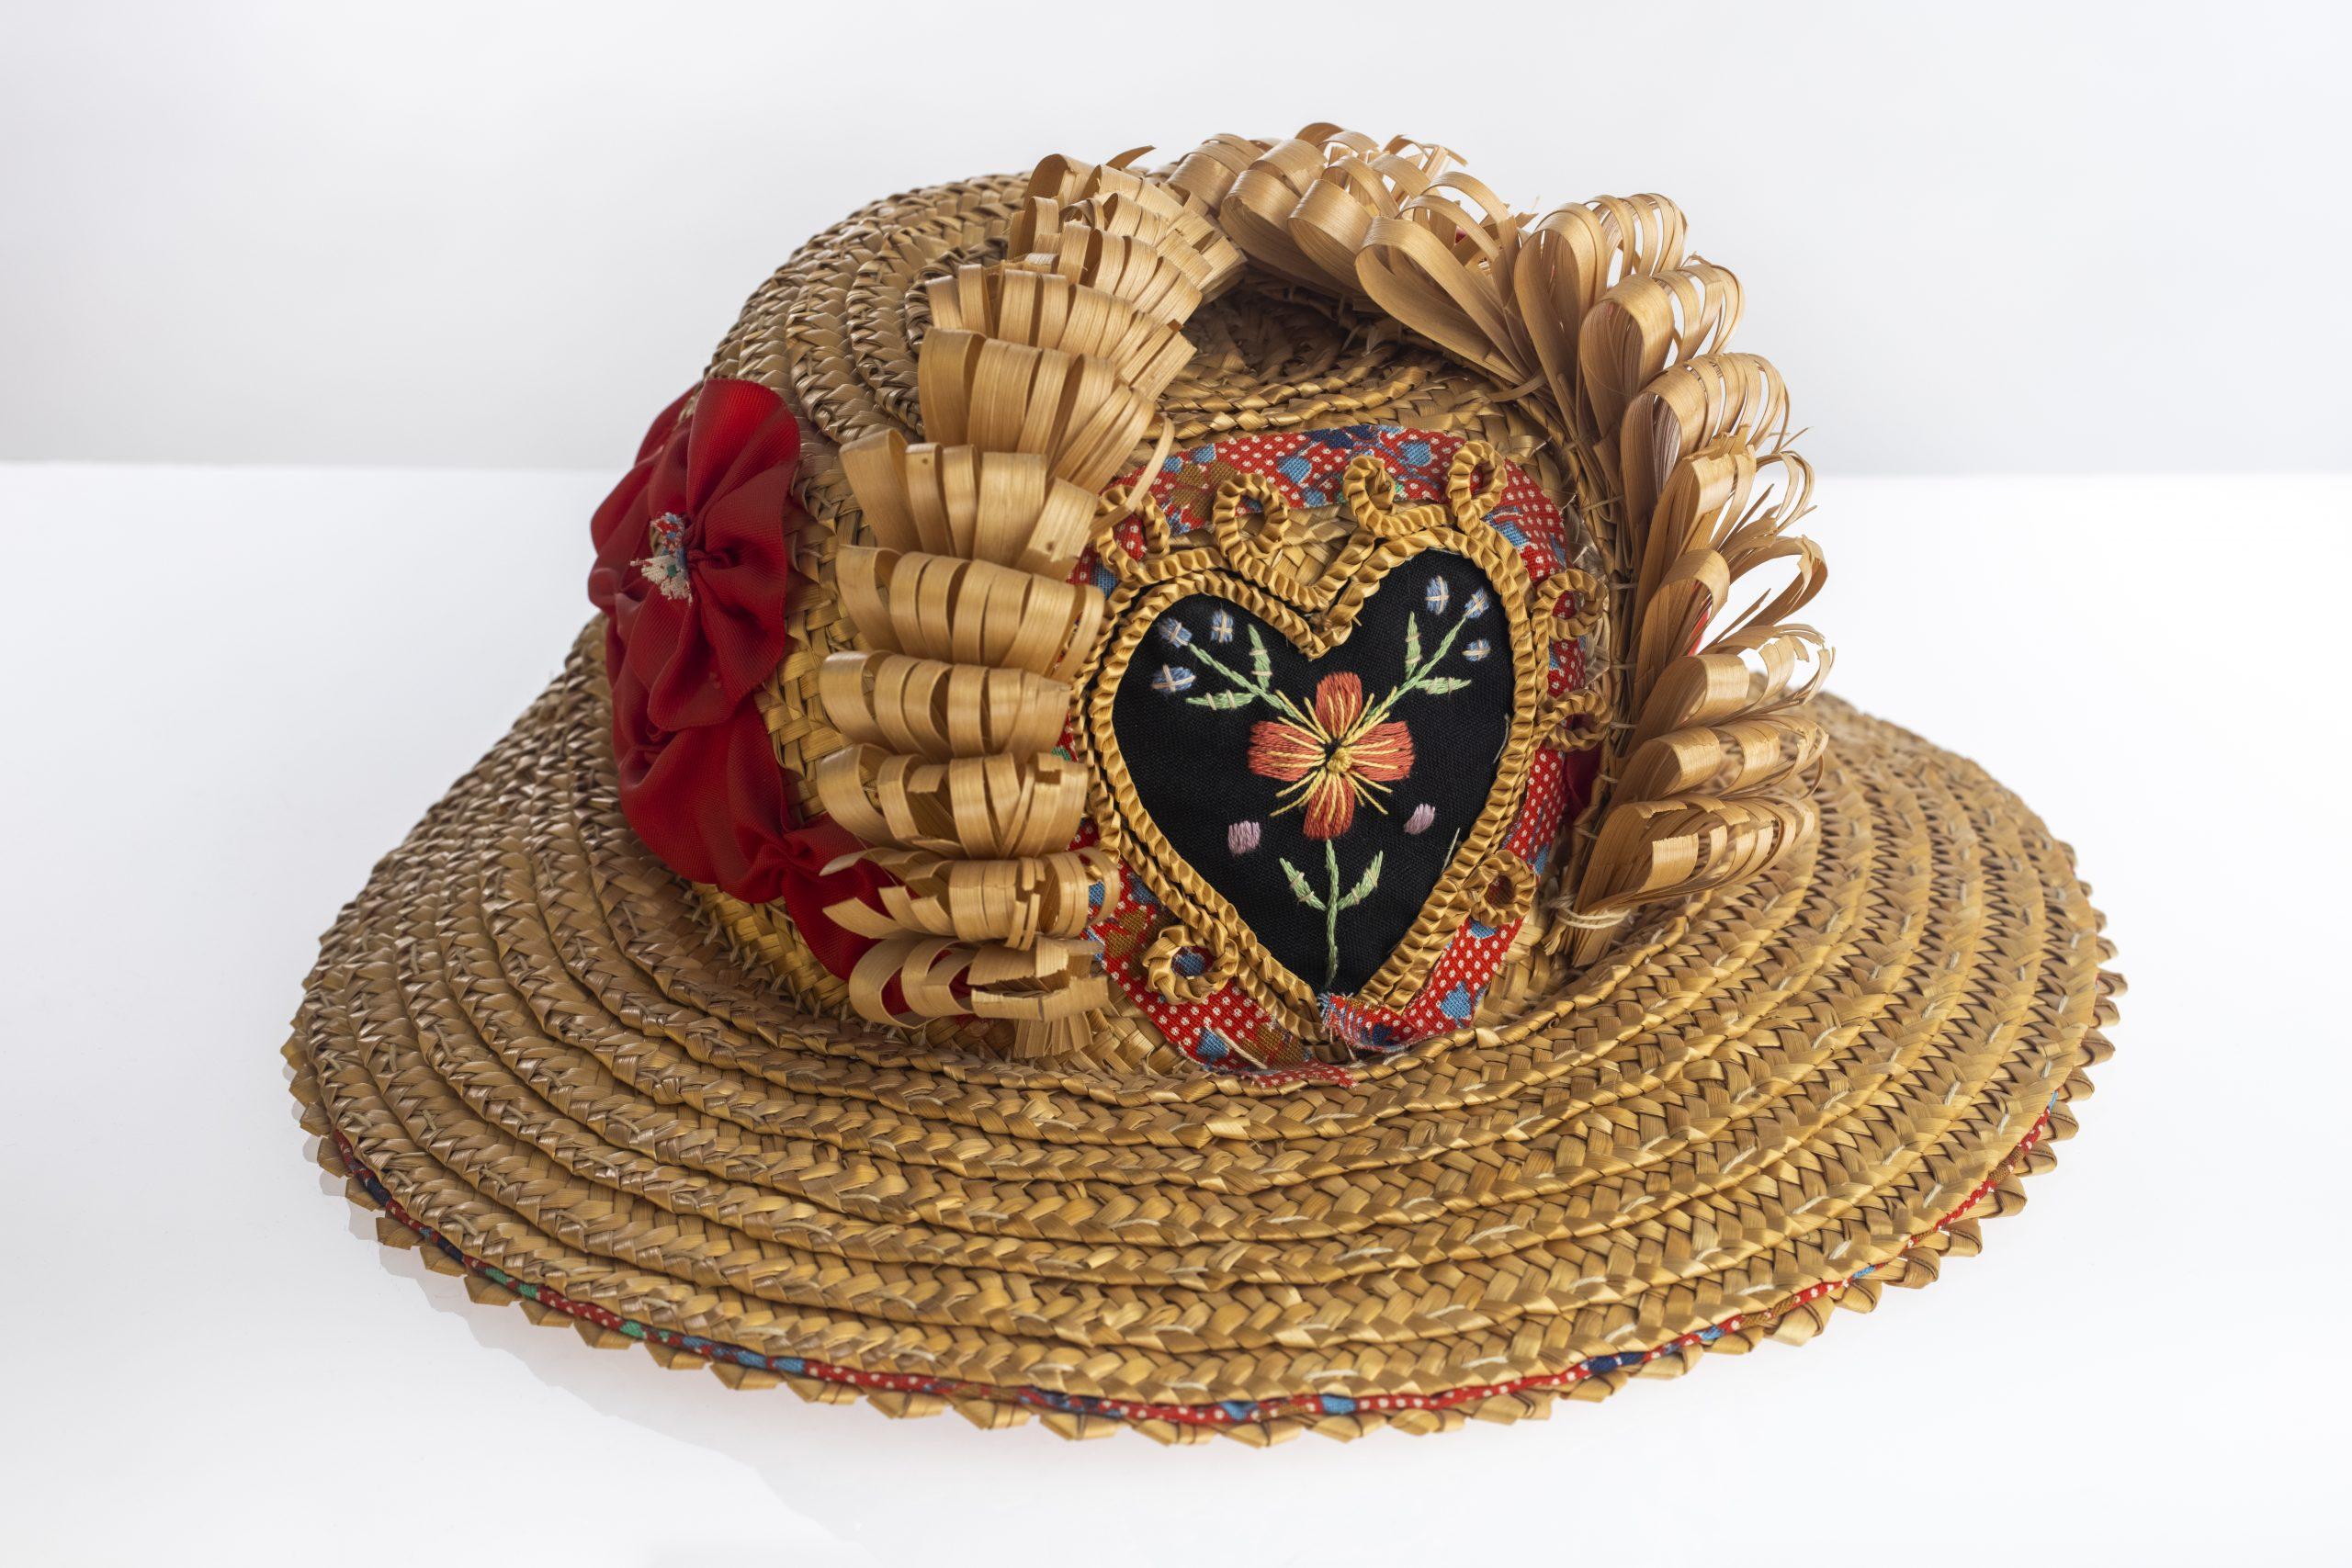 Gorra de paja, NavamojadaNavamojadaTradicional / Popular. Siglo XIX / XX.Paja de centeno/ 16 x 32 Ø máx. cm.Donación de Nicolasa Chapinal[C/83/2/2247]. Sala I